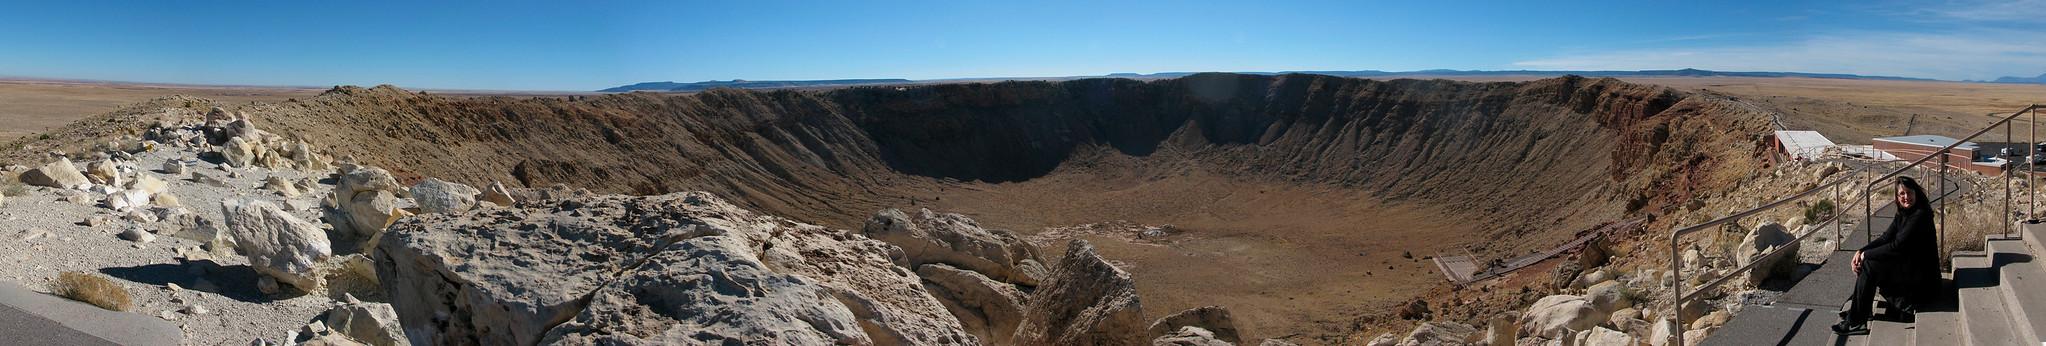 Earth, Meteor Crater, Arizona, 2012-12